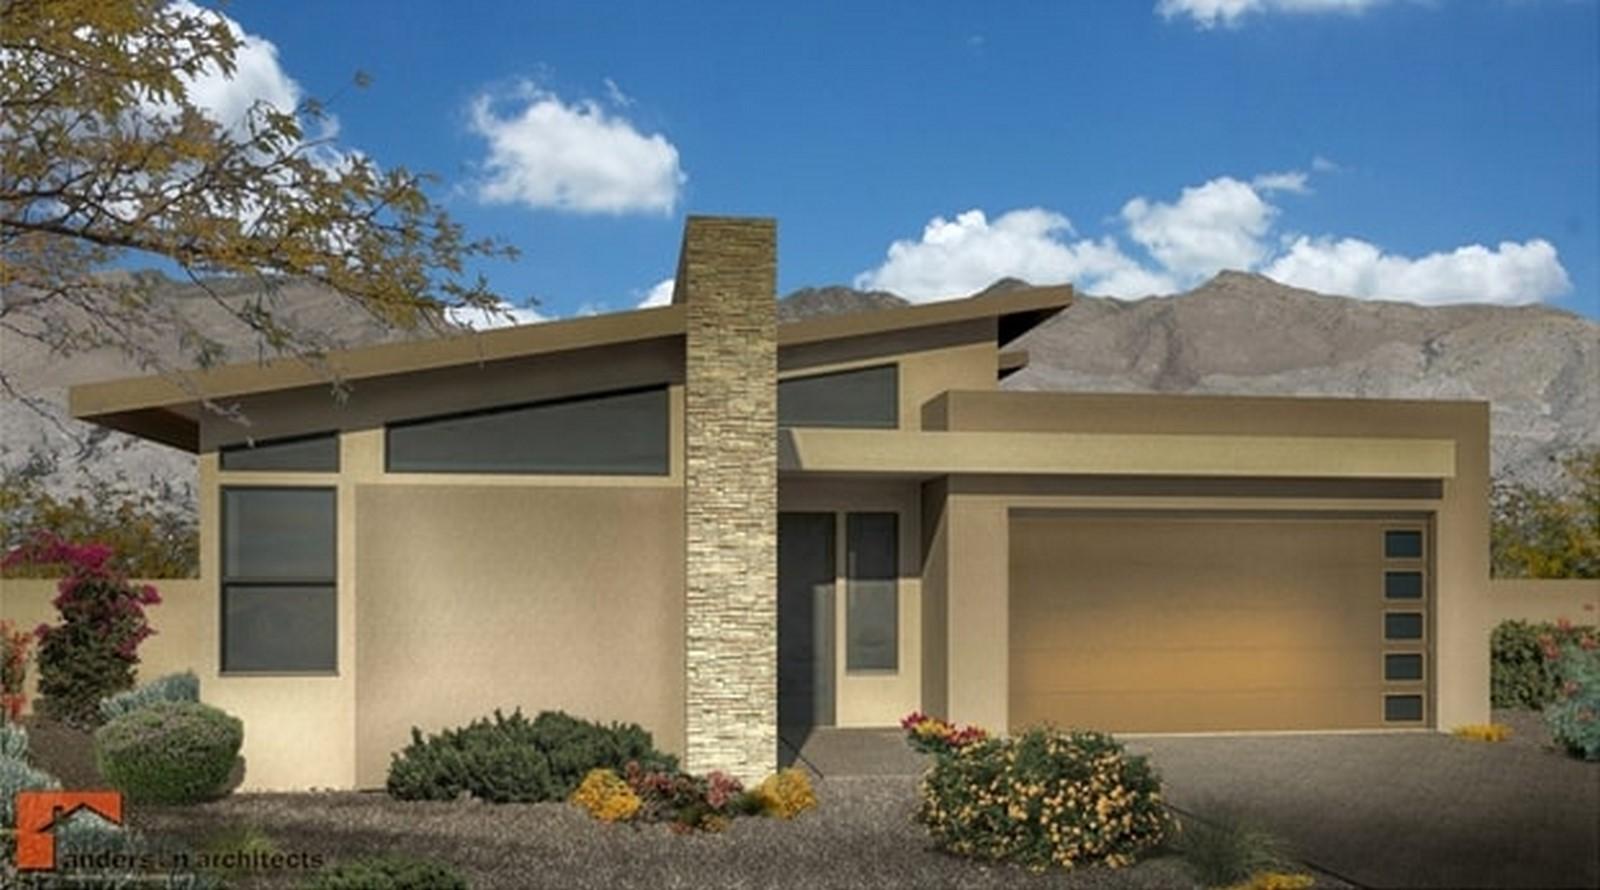 Architects in Tucson - Top 90 Architects in Tucson - Sheet5